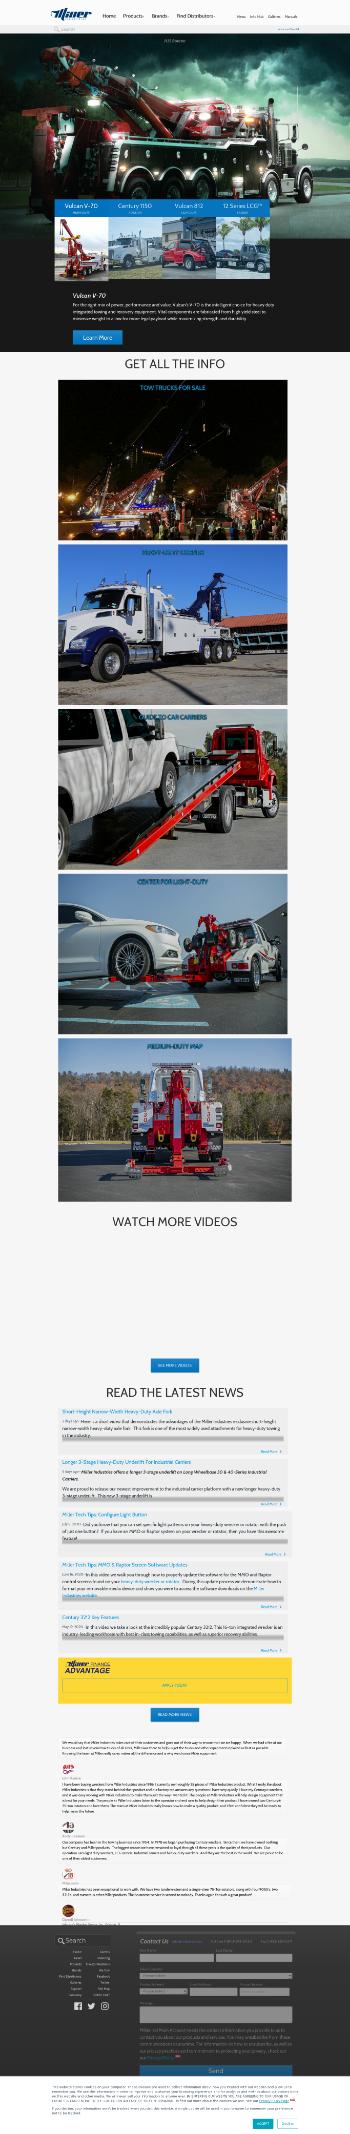 Miller Industries, Inc. Website Screenshot